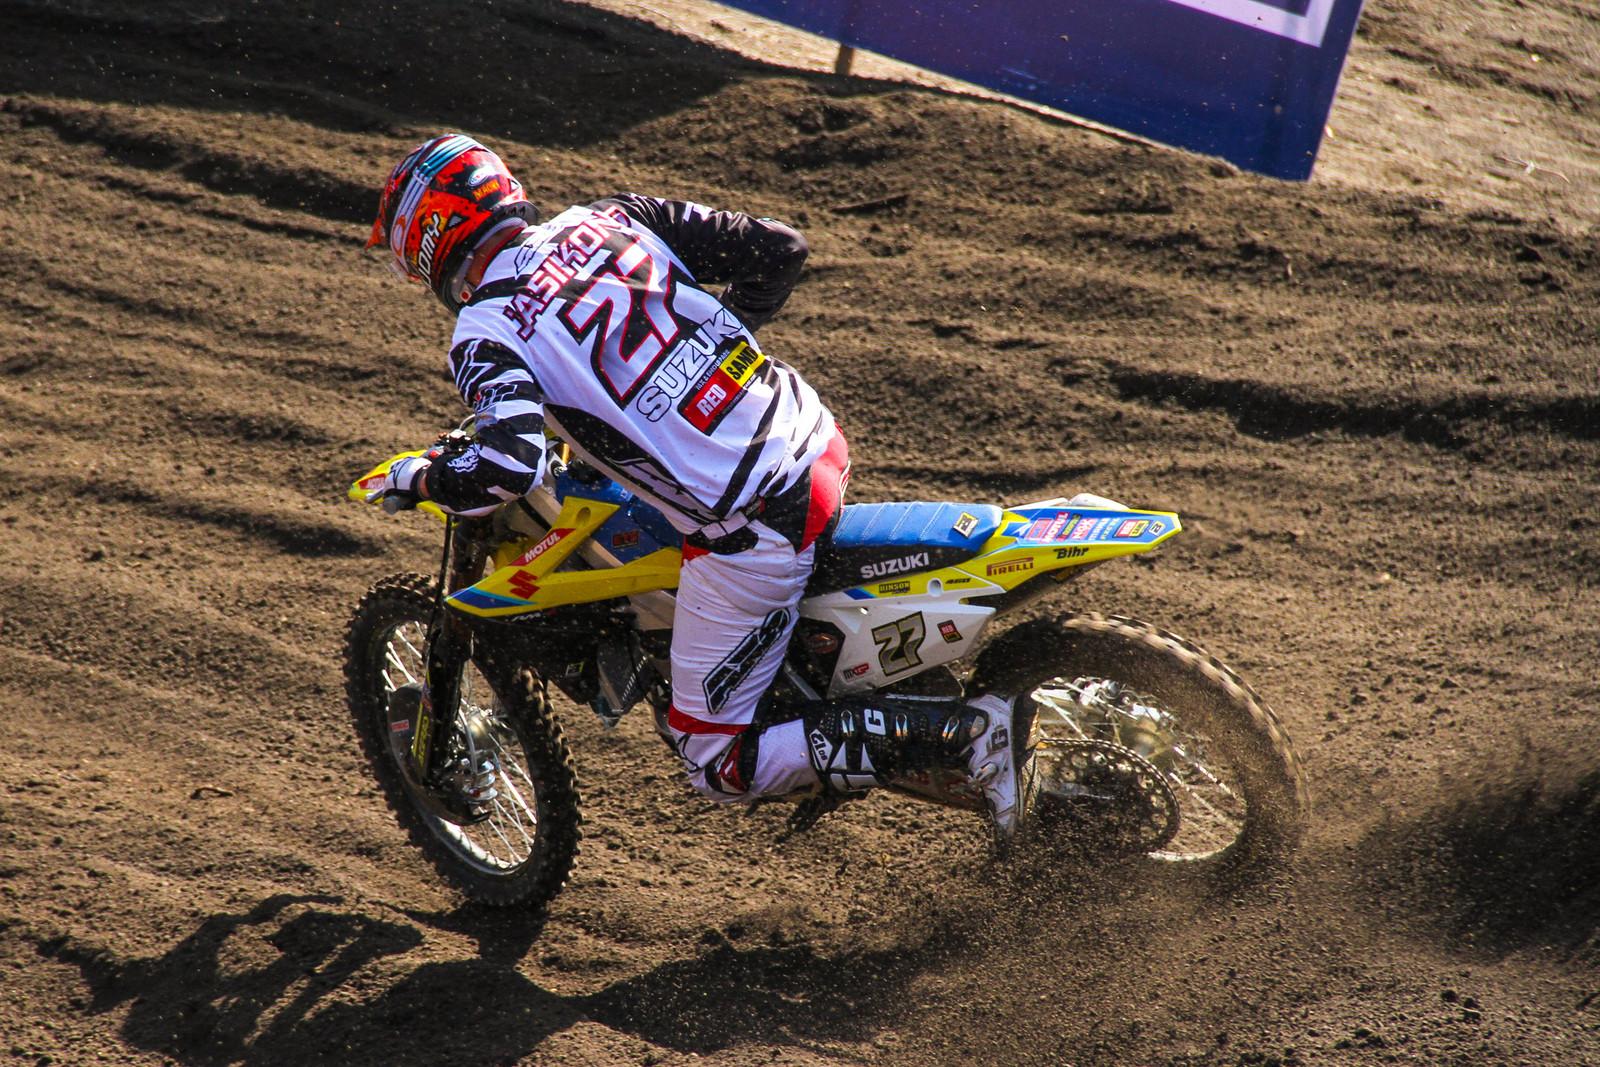 Arminas Jasikonis - Photo Blast: 2017 MXGP of Argentina - Motocross Pictures - Vital MX